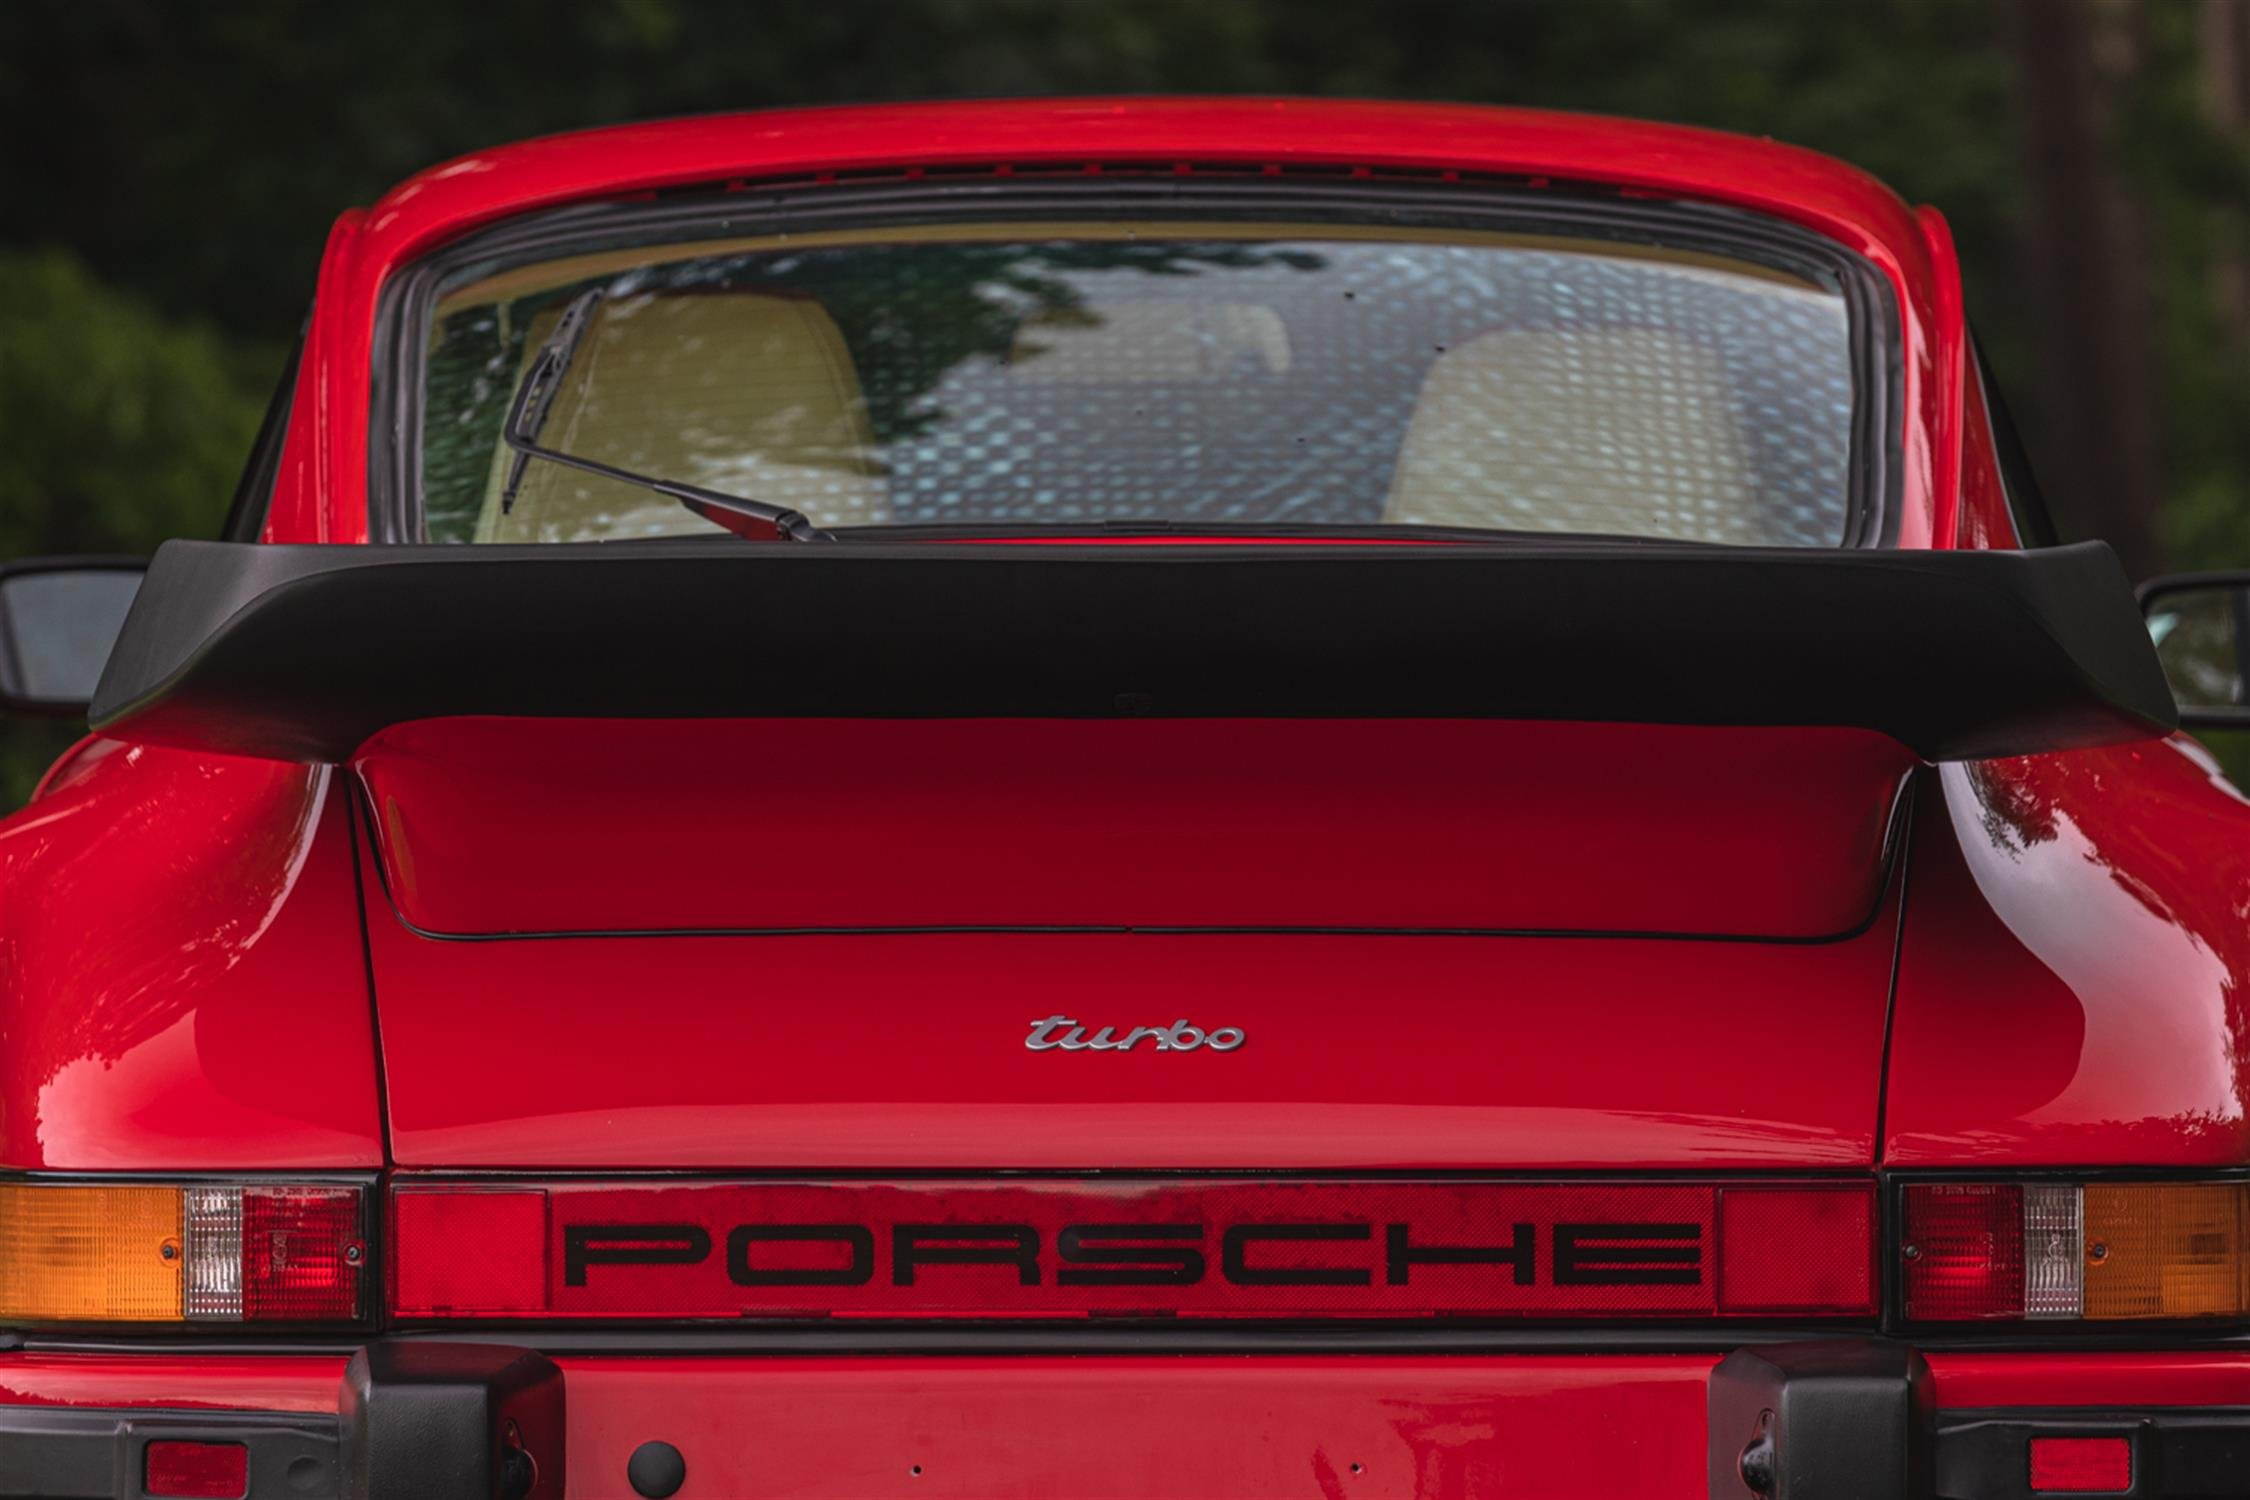 1986 Porsche 911 (930) Turbo SE 'Flatnose' - Image 8 of 10